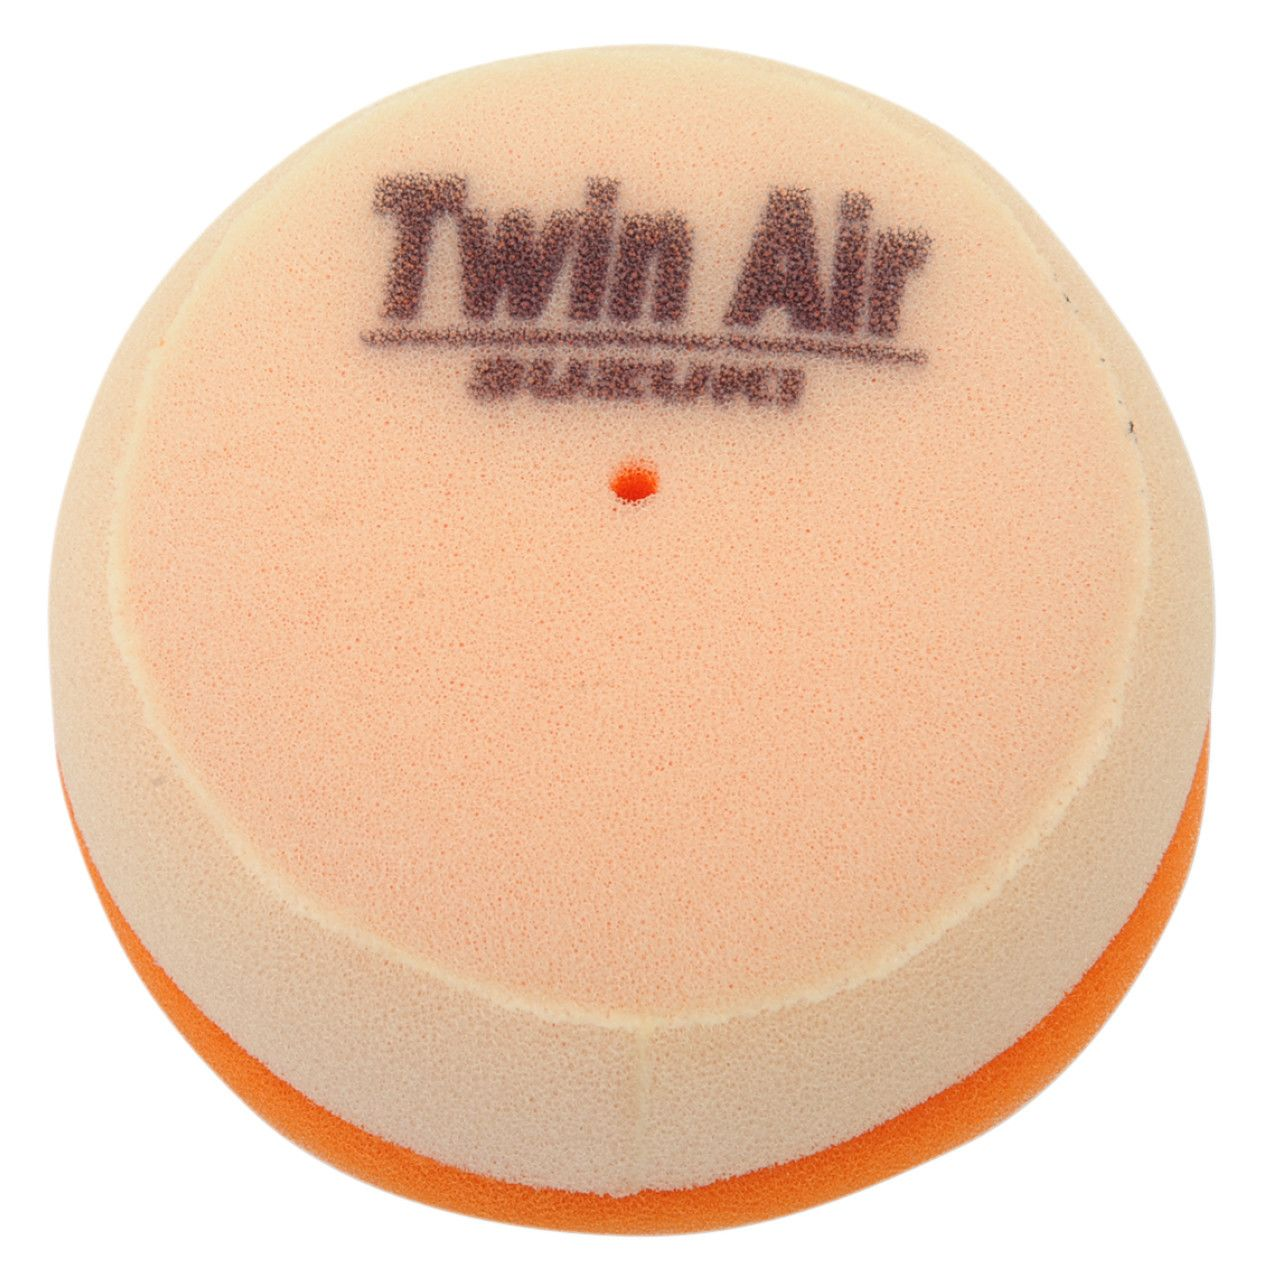 Twin Air Air Filter Suzuki RM125 / RM250 / RMZ 250 / RMZ 450 2003-2018 |  10% ($3 09) Off!